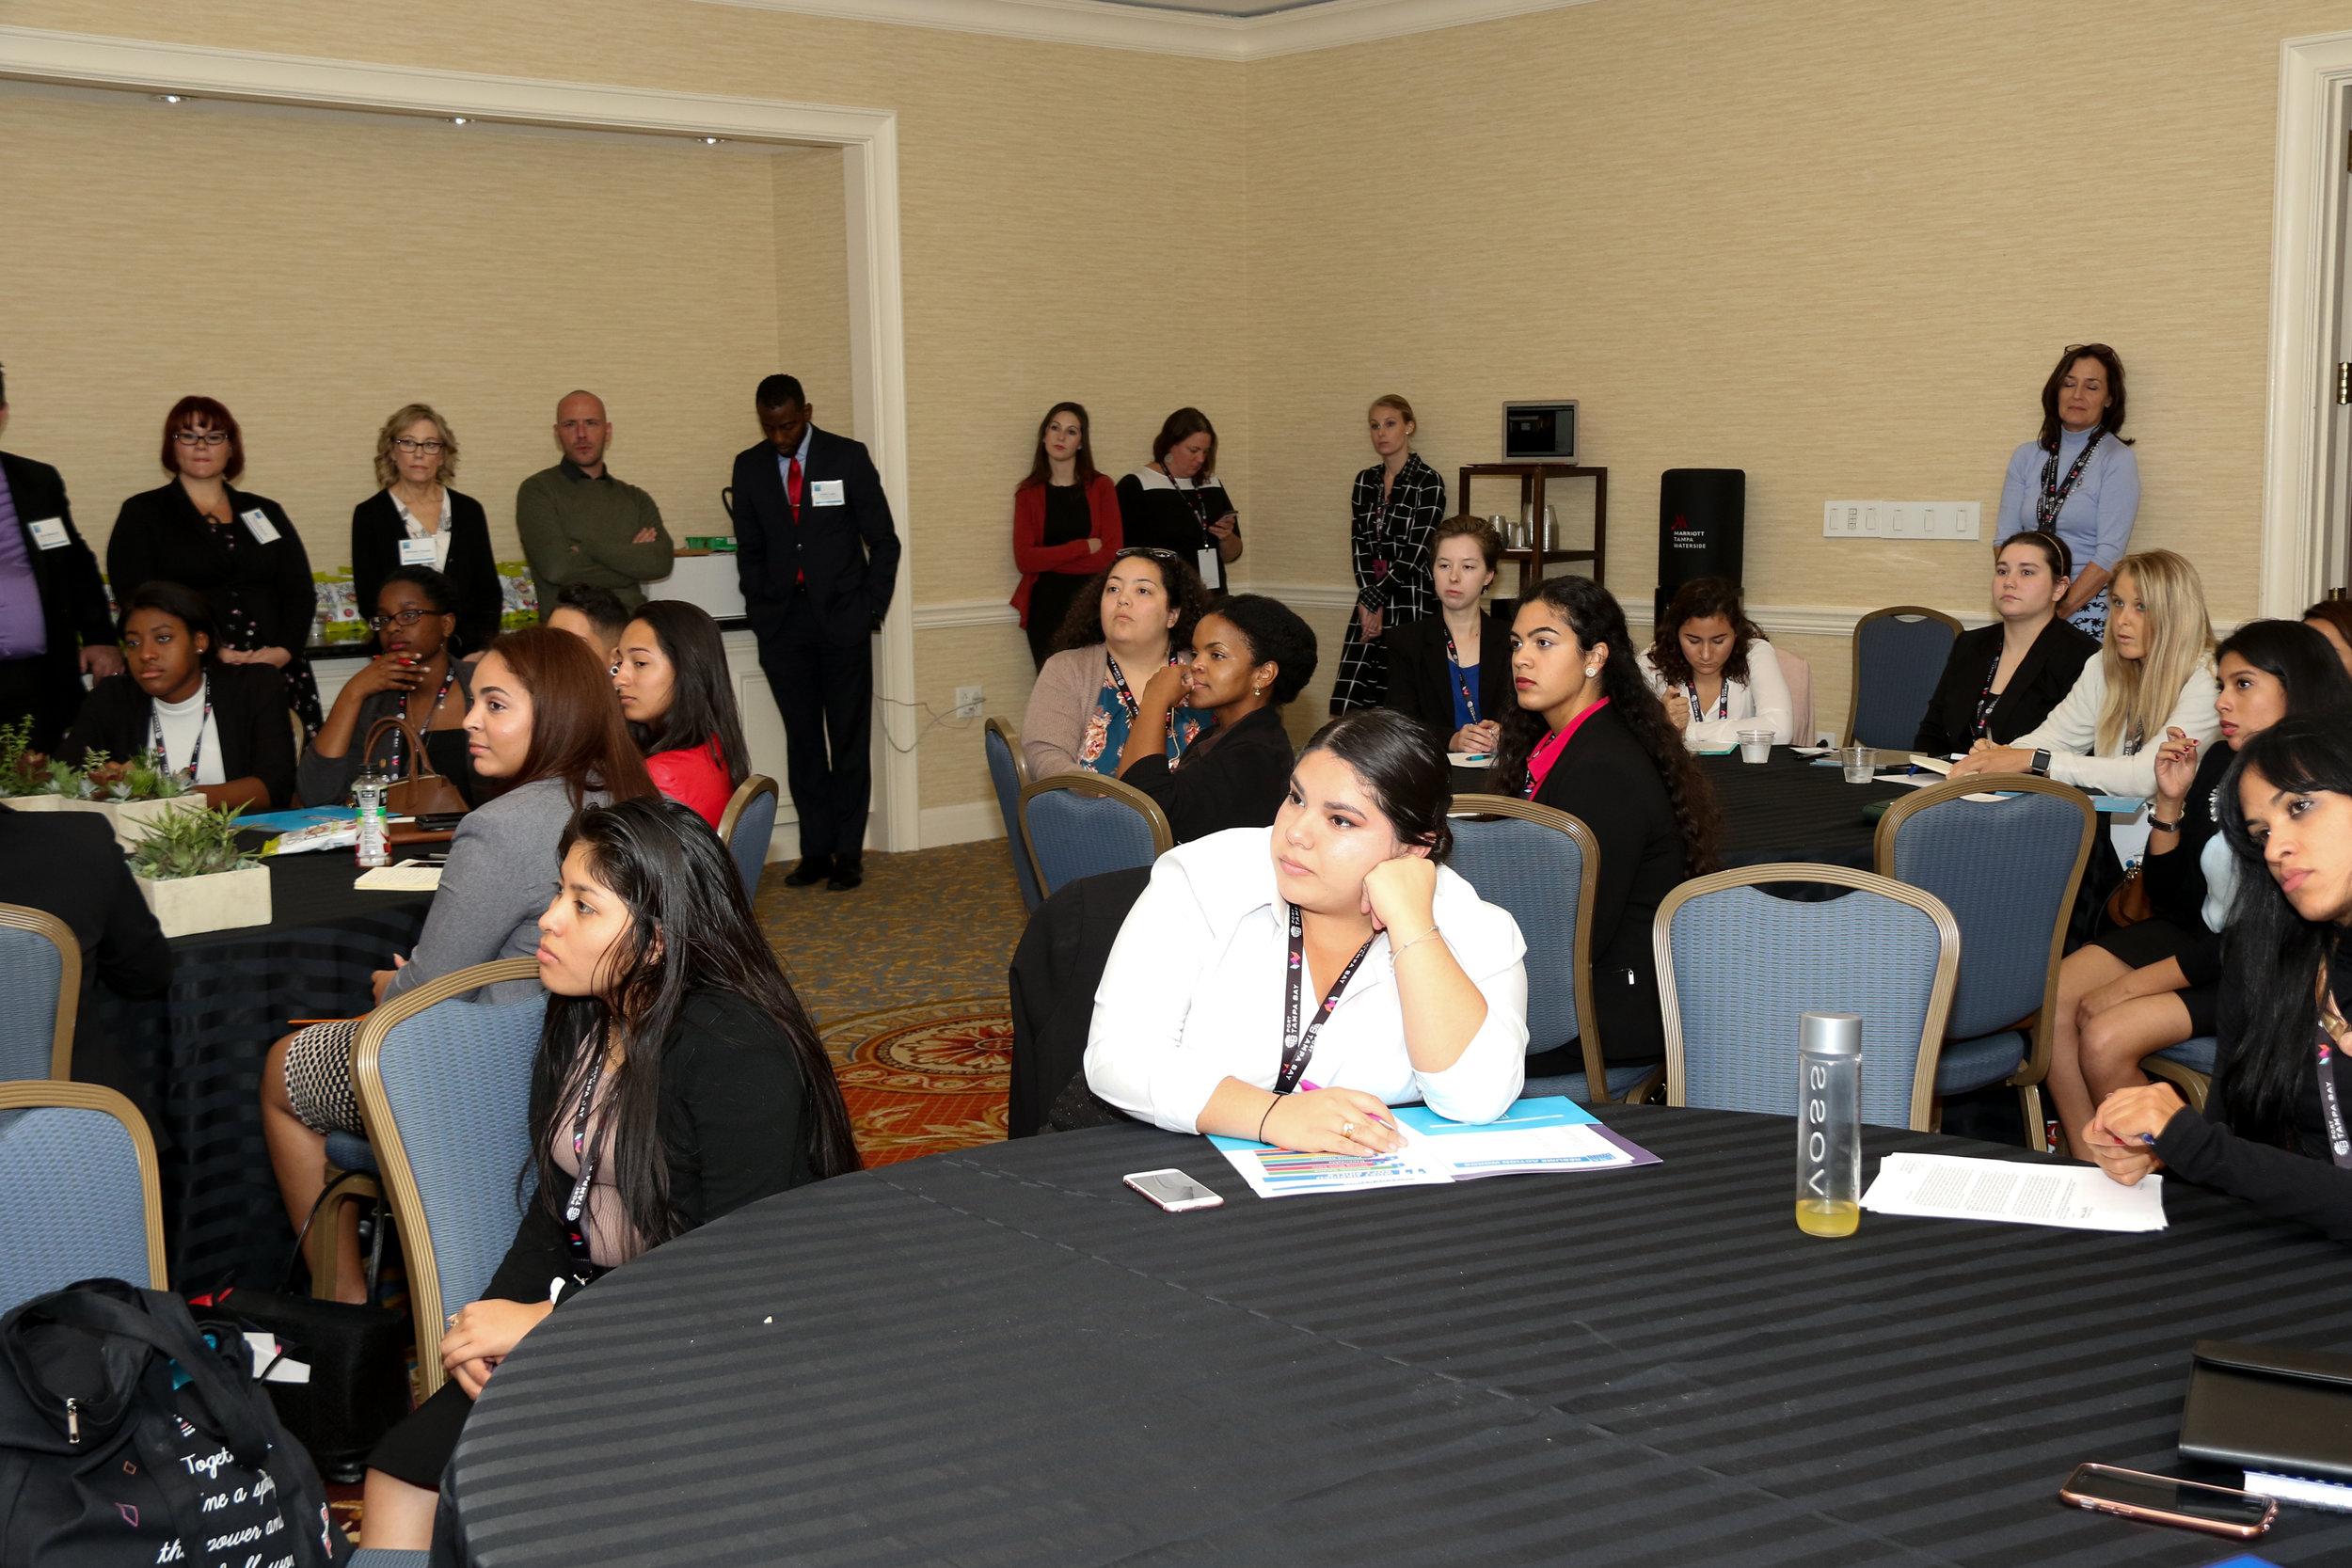 621_WomensConference_10-27-17.jpg